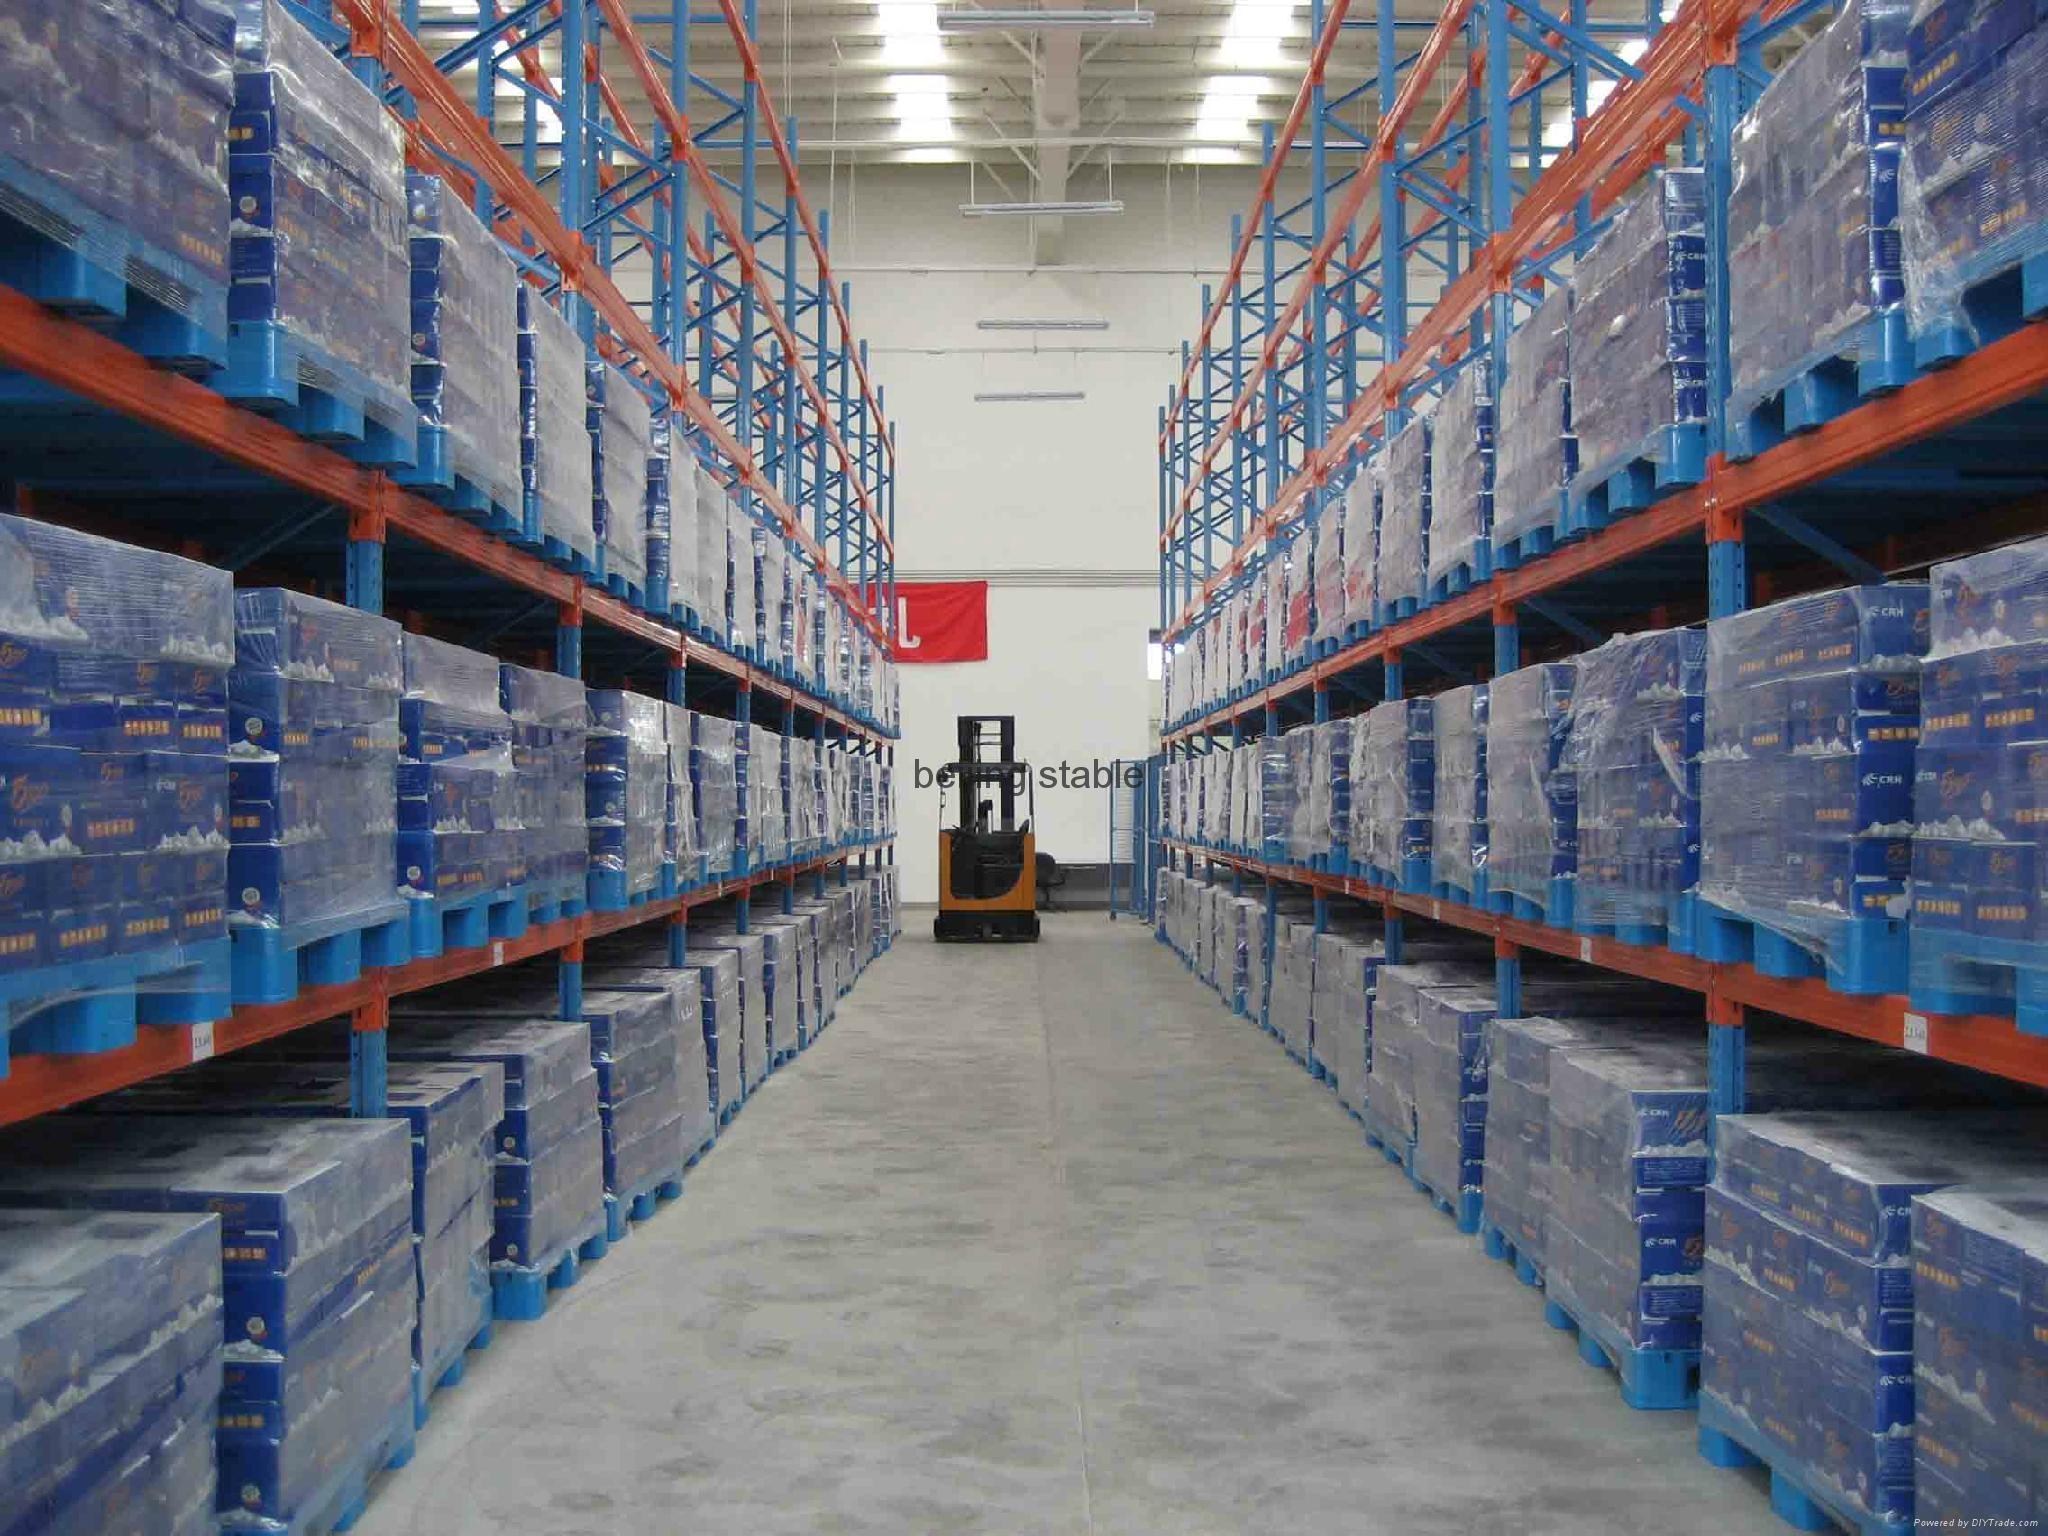 steel Heavy Duty rack she  ing system for warehouse from Beijign stable 5